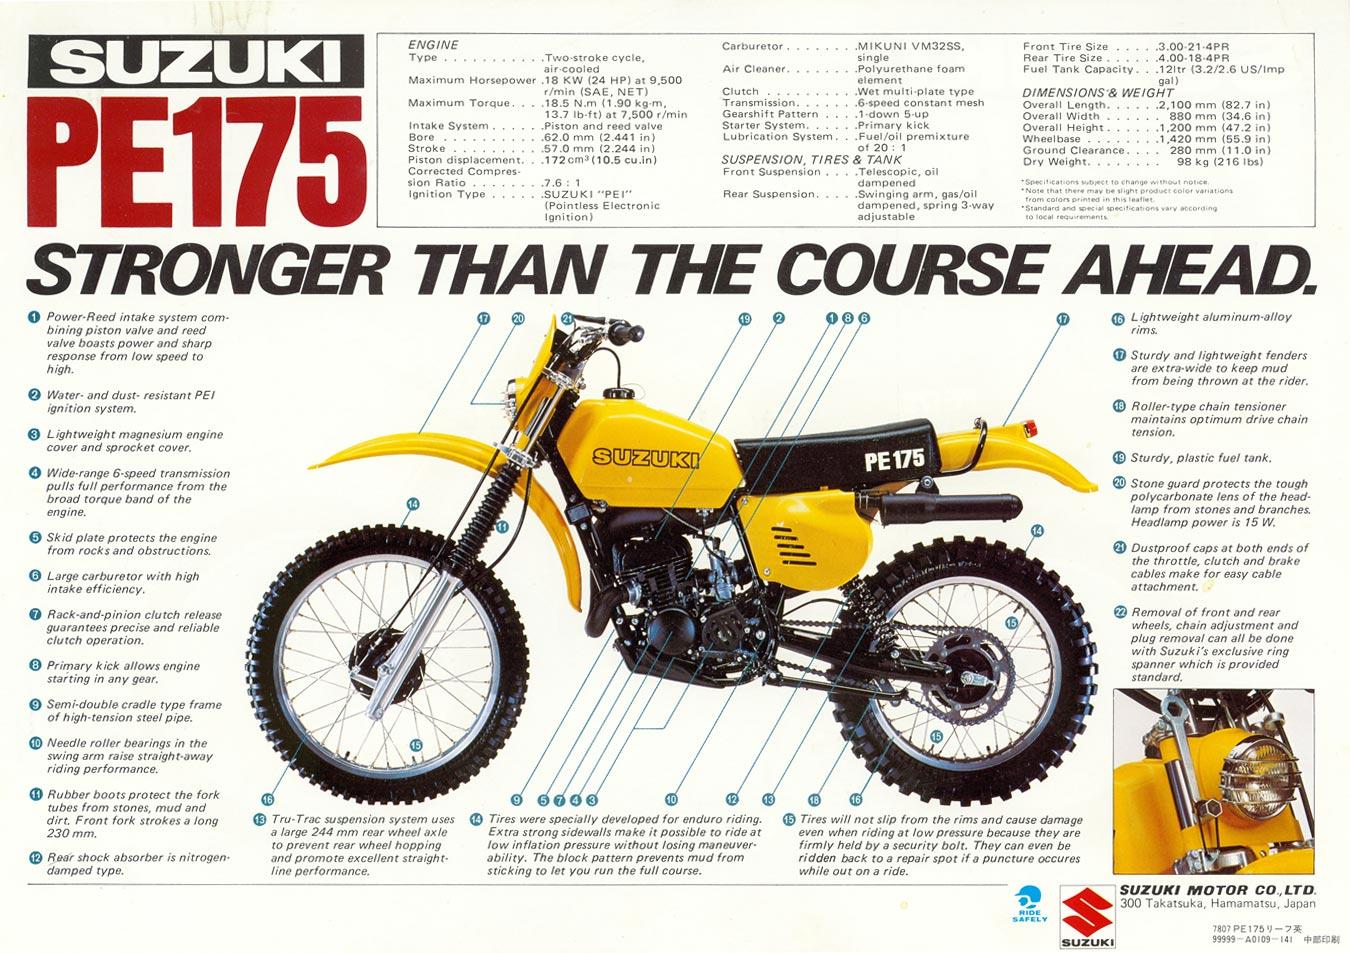 Suzuki Pe 175 Wire Diagram Wiring Library. Suzuki Pe 175 Wire Diagram. Suzuki. Suzuki Pe400 Wiring Diagram At Scoala.co